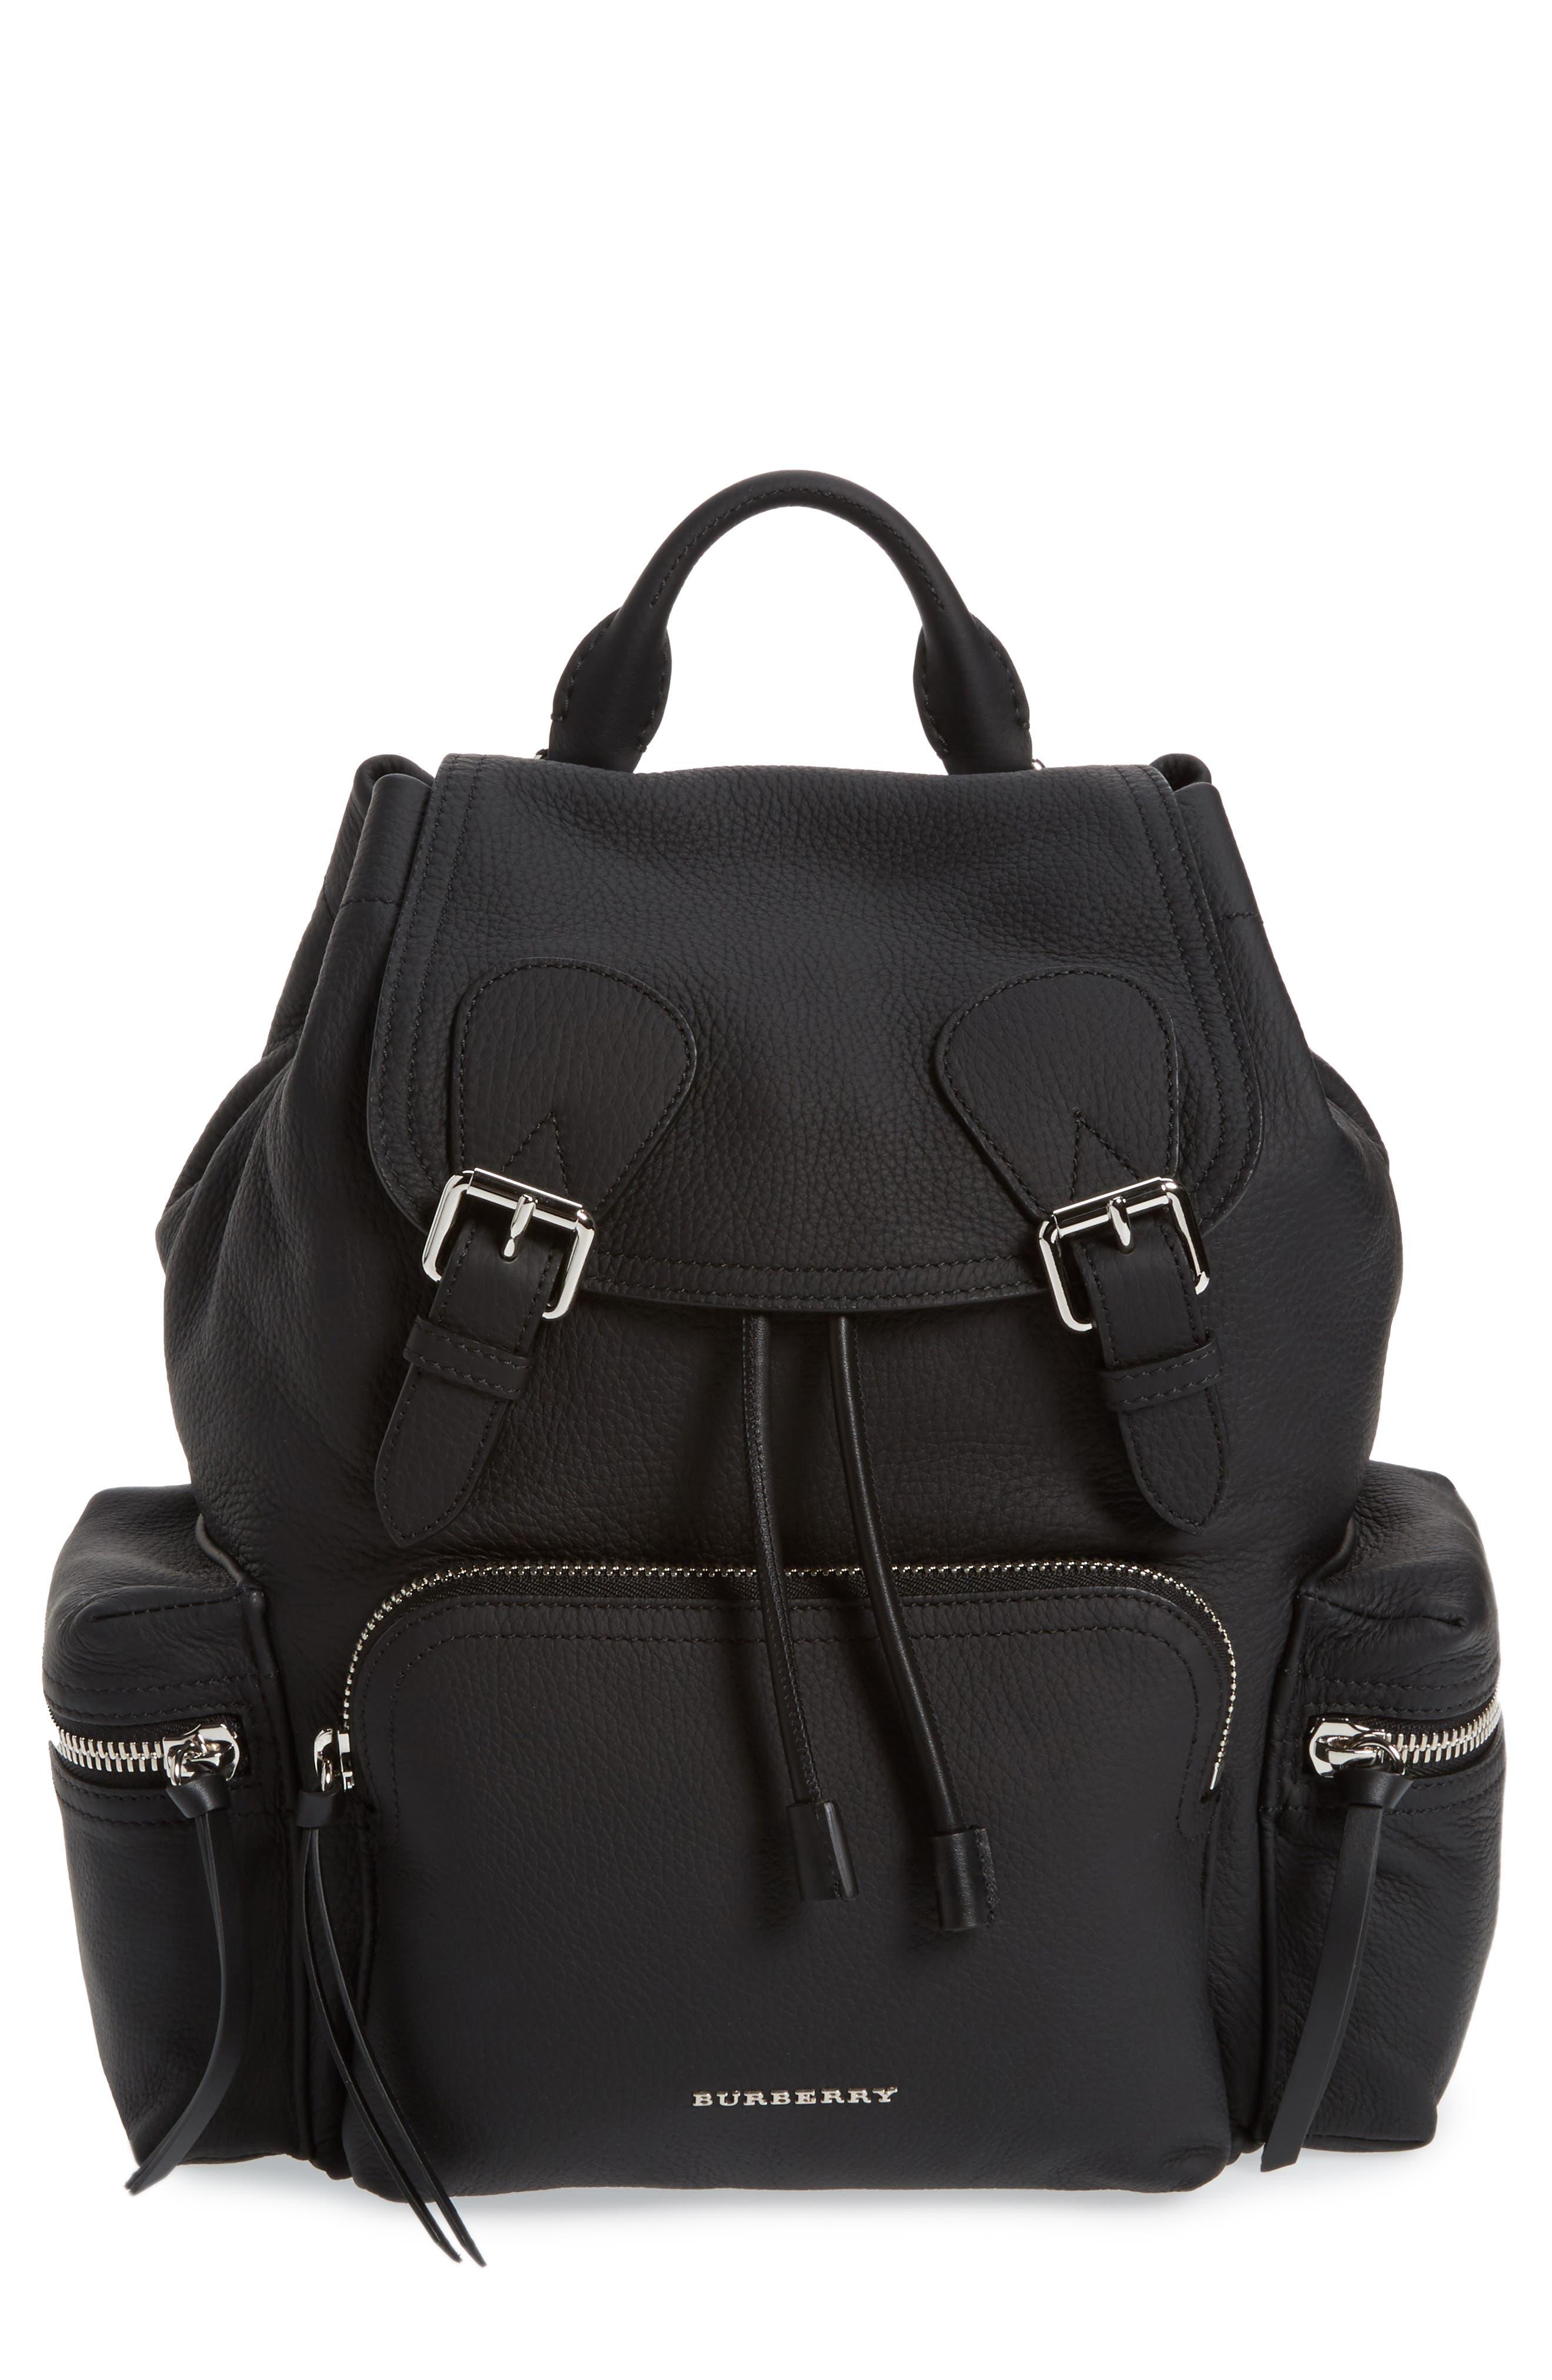 Alternate Image 1 Selected - Burberry Medium Rucksack Leather Backpack